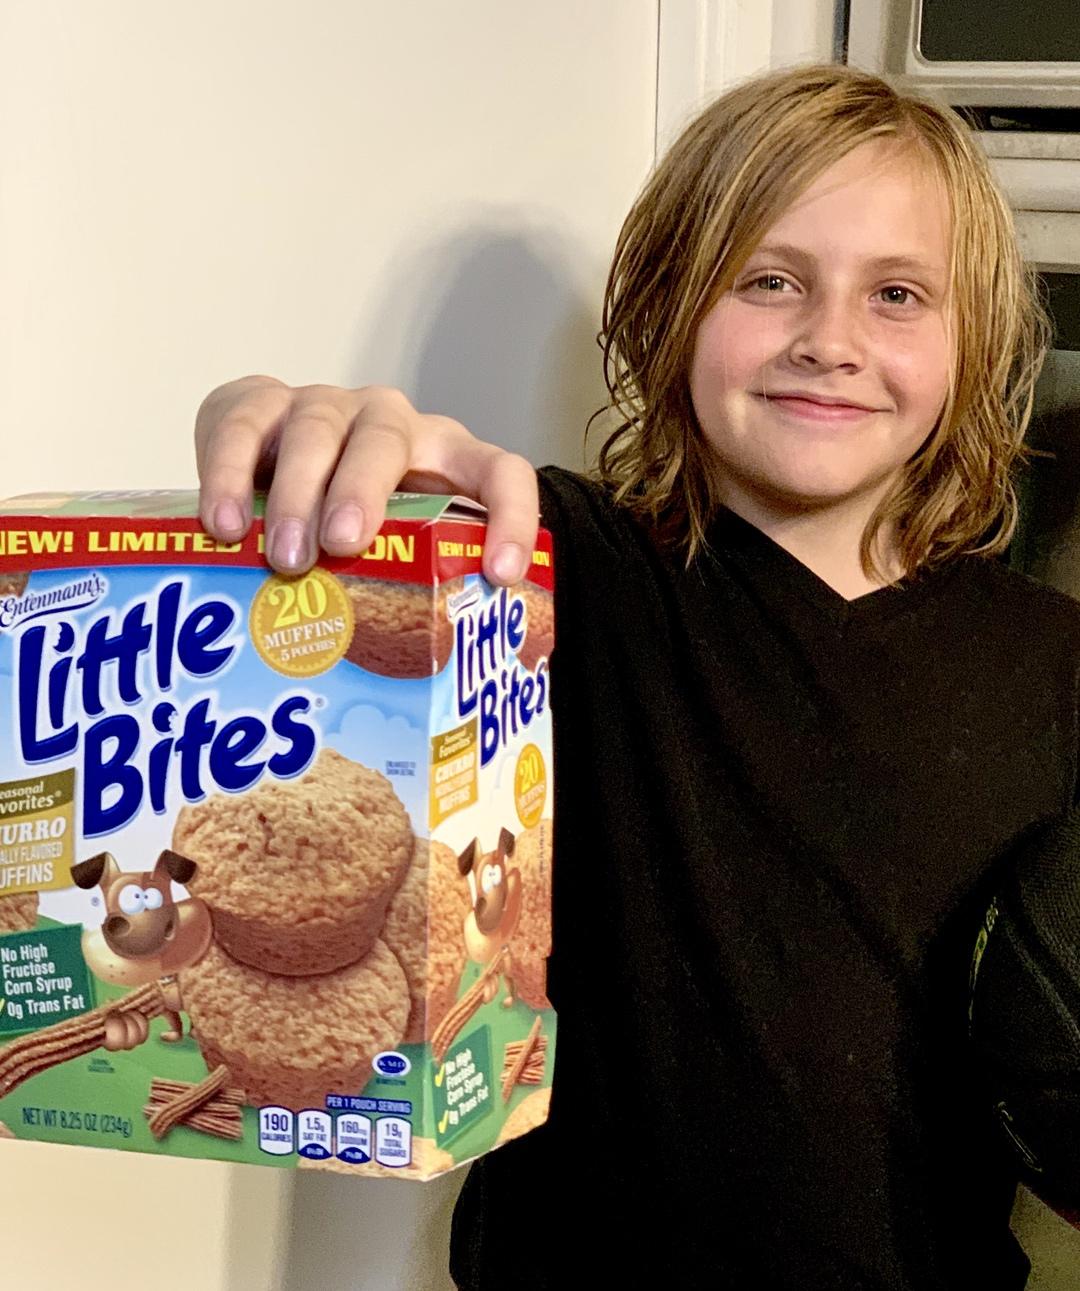 Entenmann's Little Bites Churro Muffins #Entenmanns #LittleBites #LoveLittleBites #LBChurro #Giveaway #ad